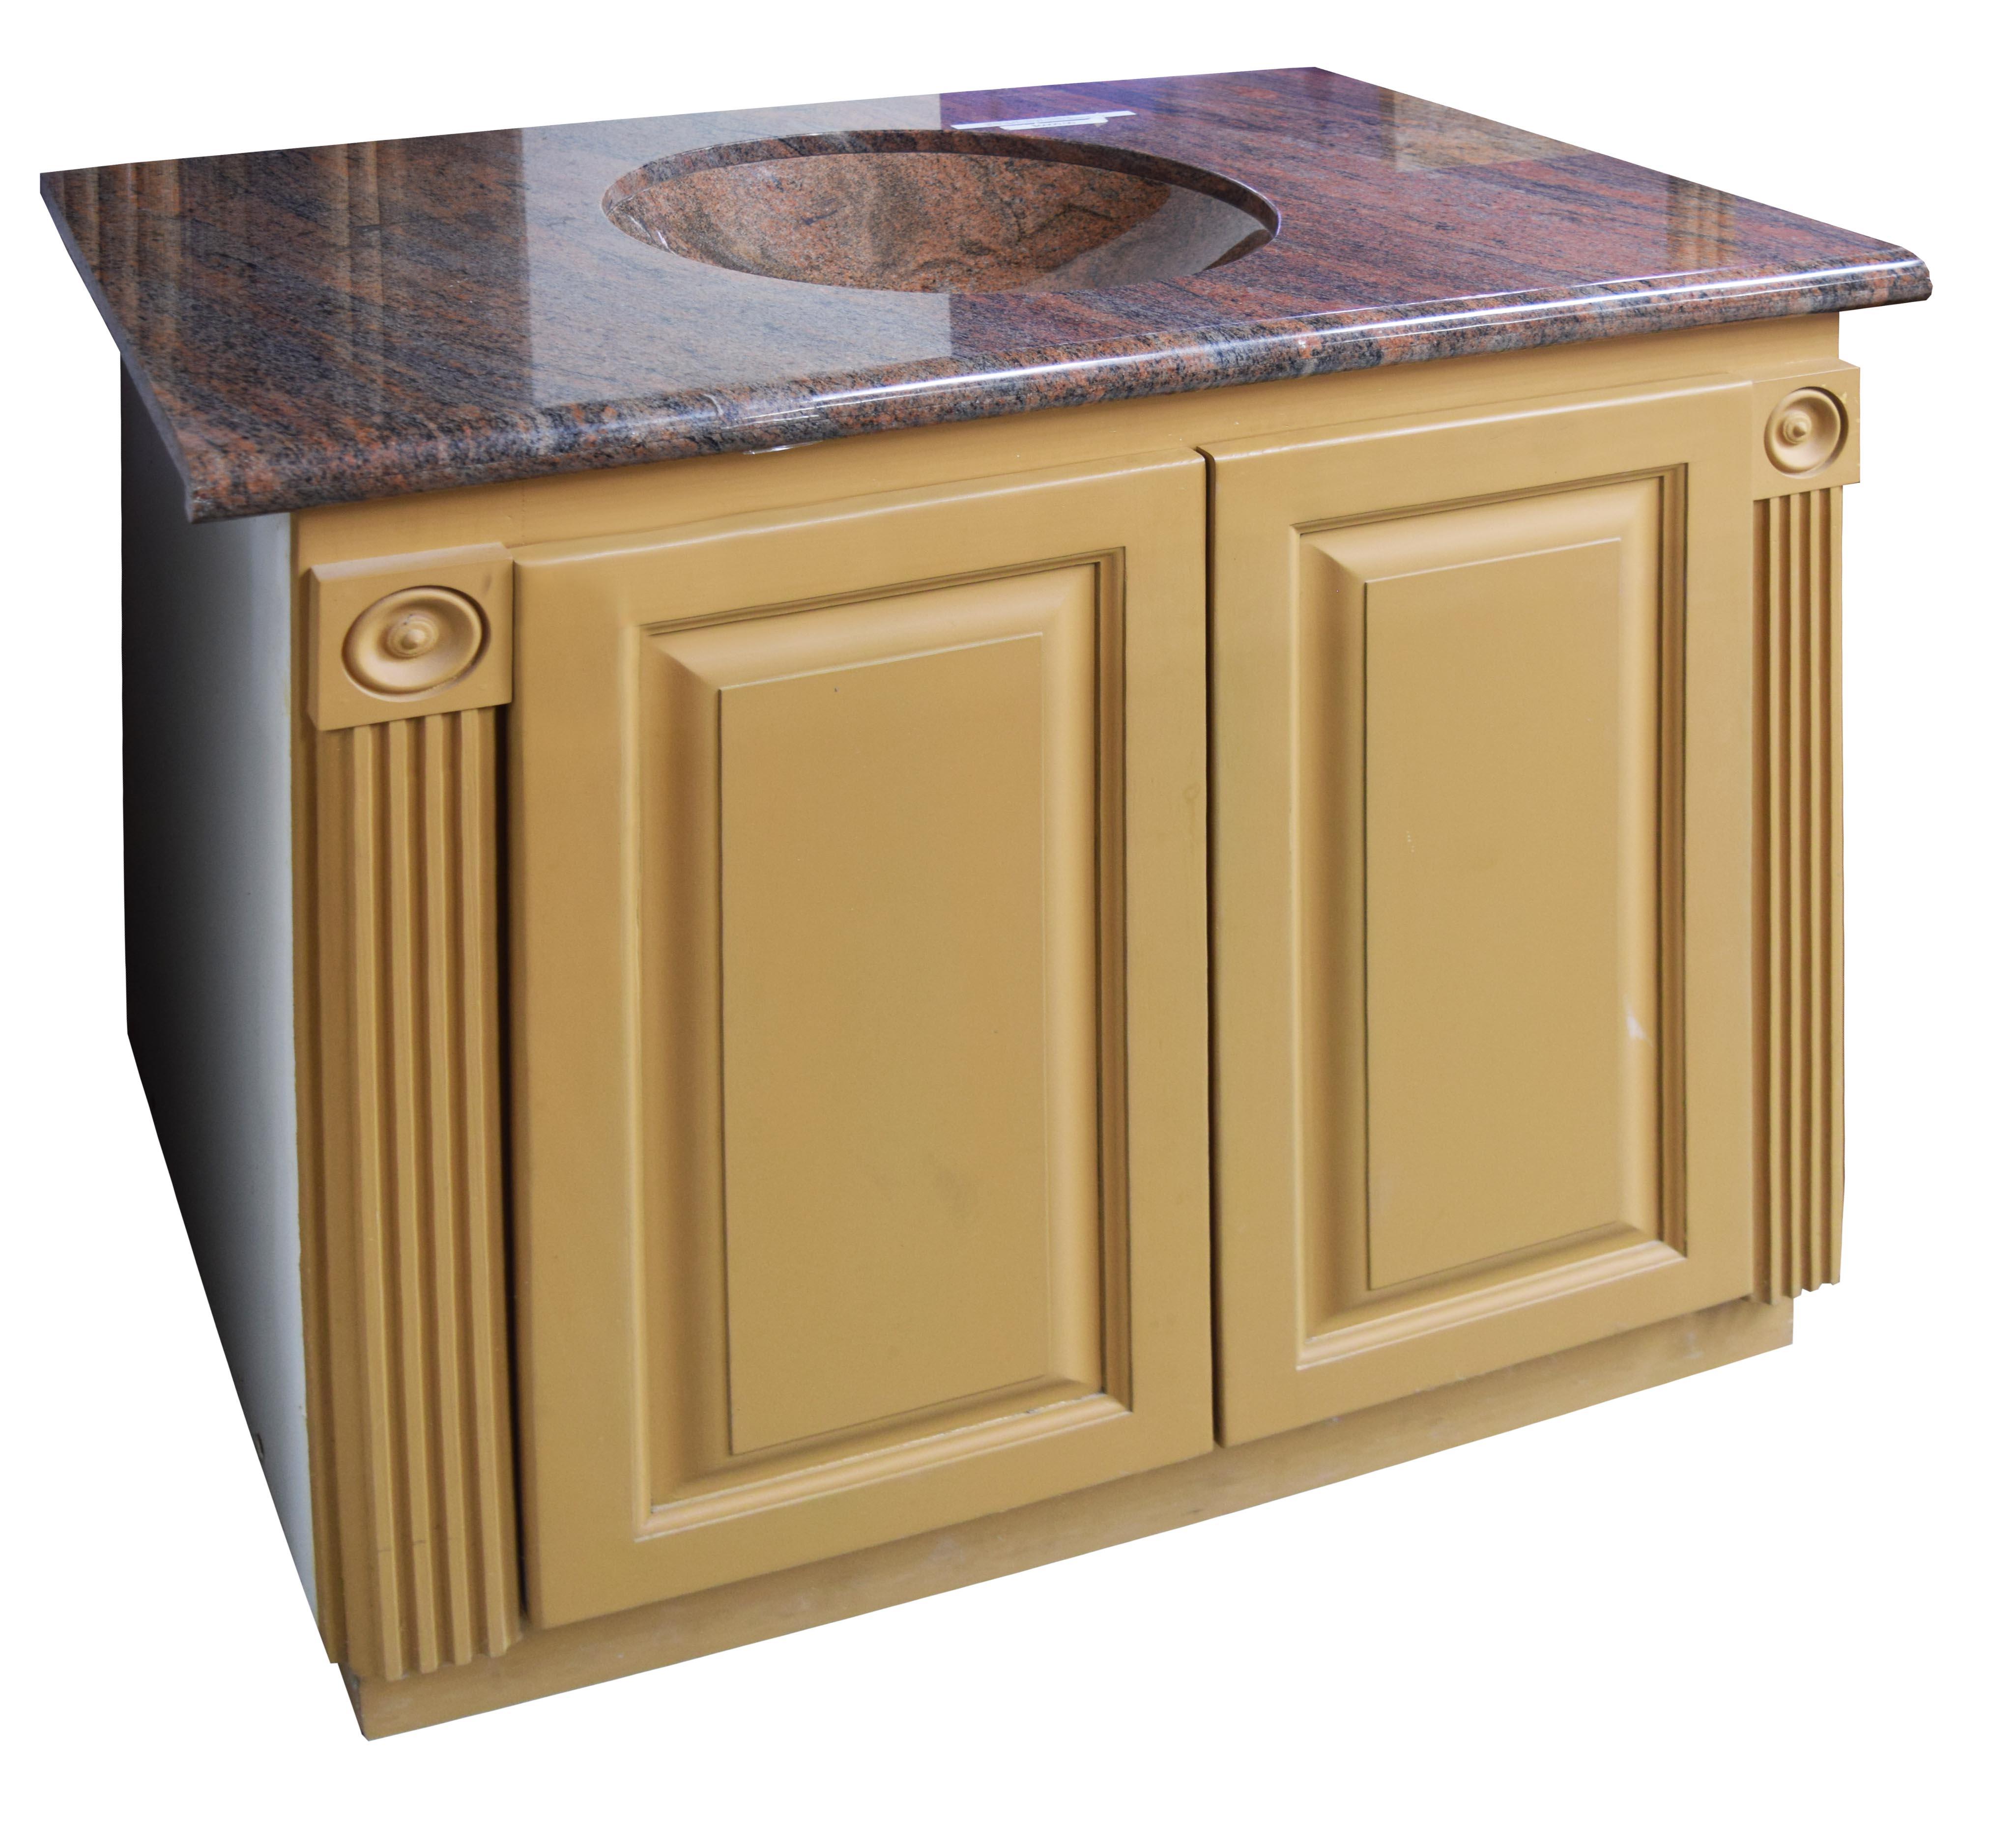 Wooden Bathroom Vanity Sets With Granite Countertops - White